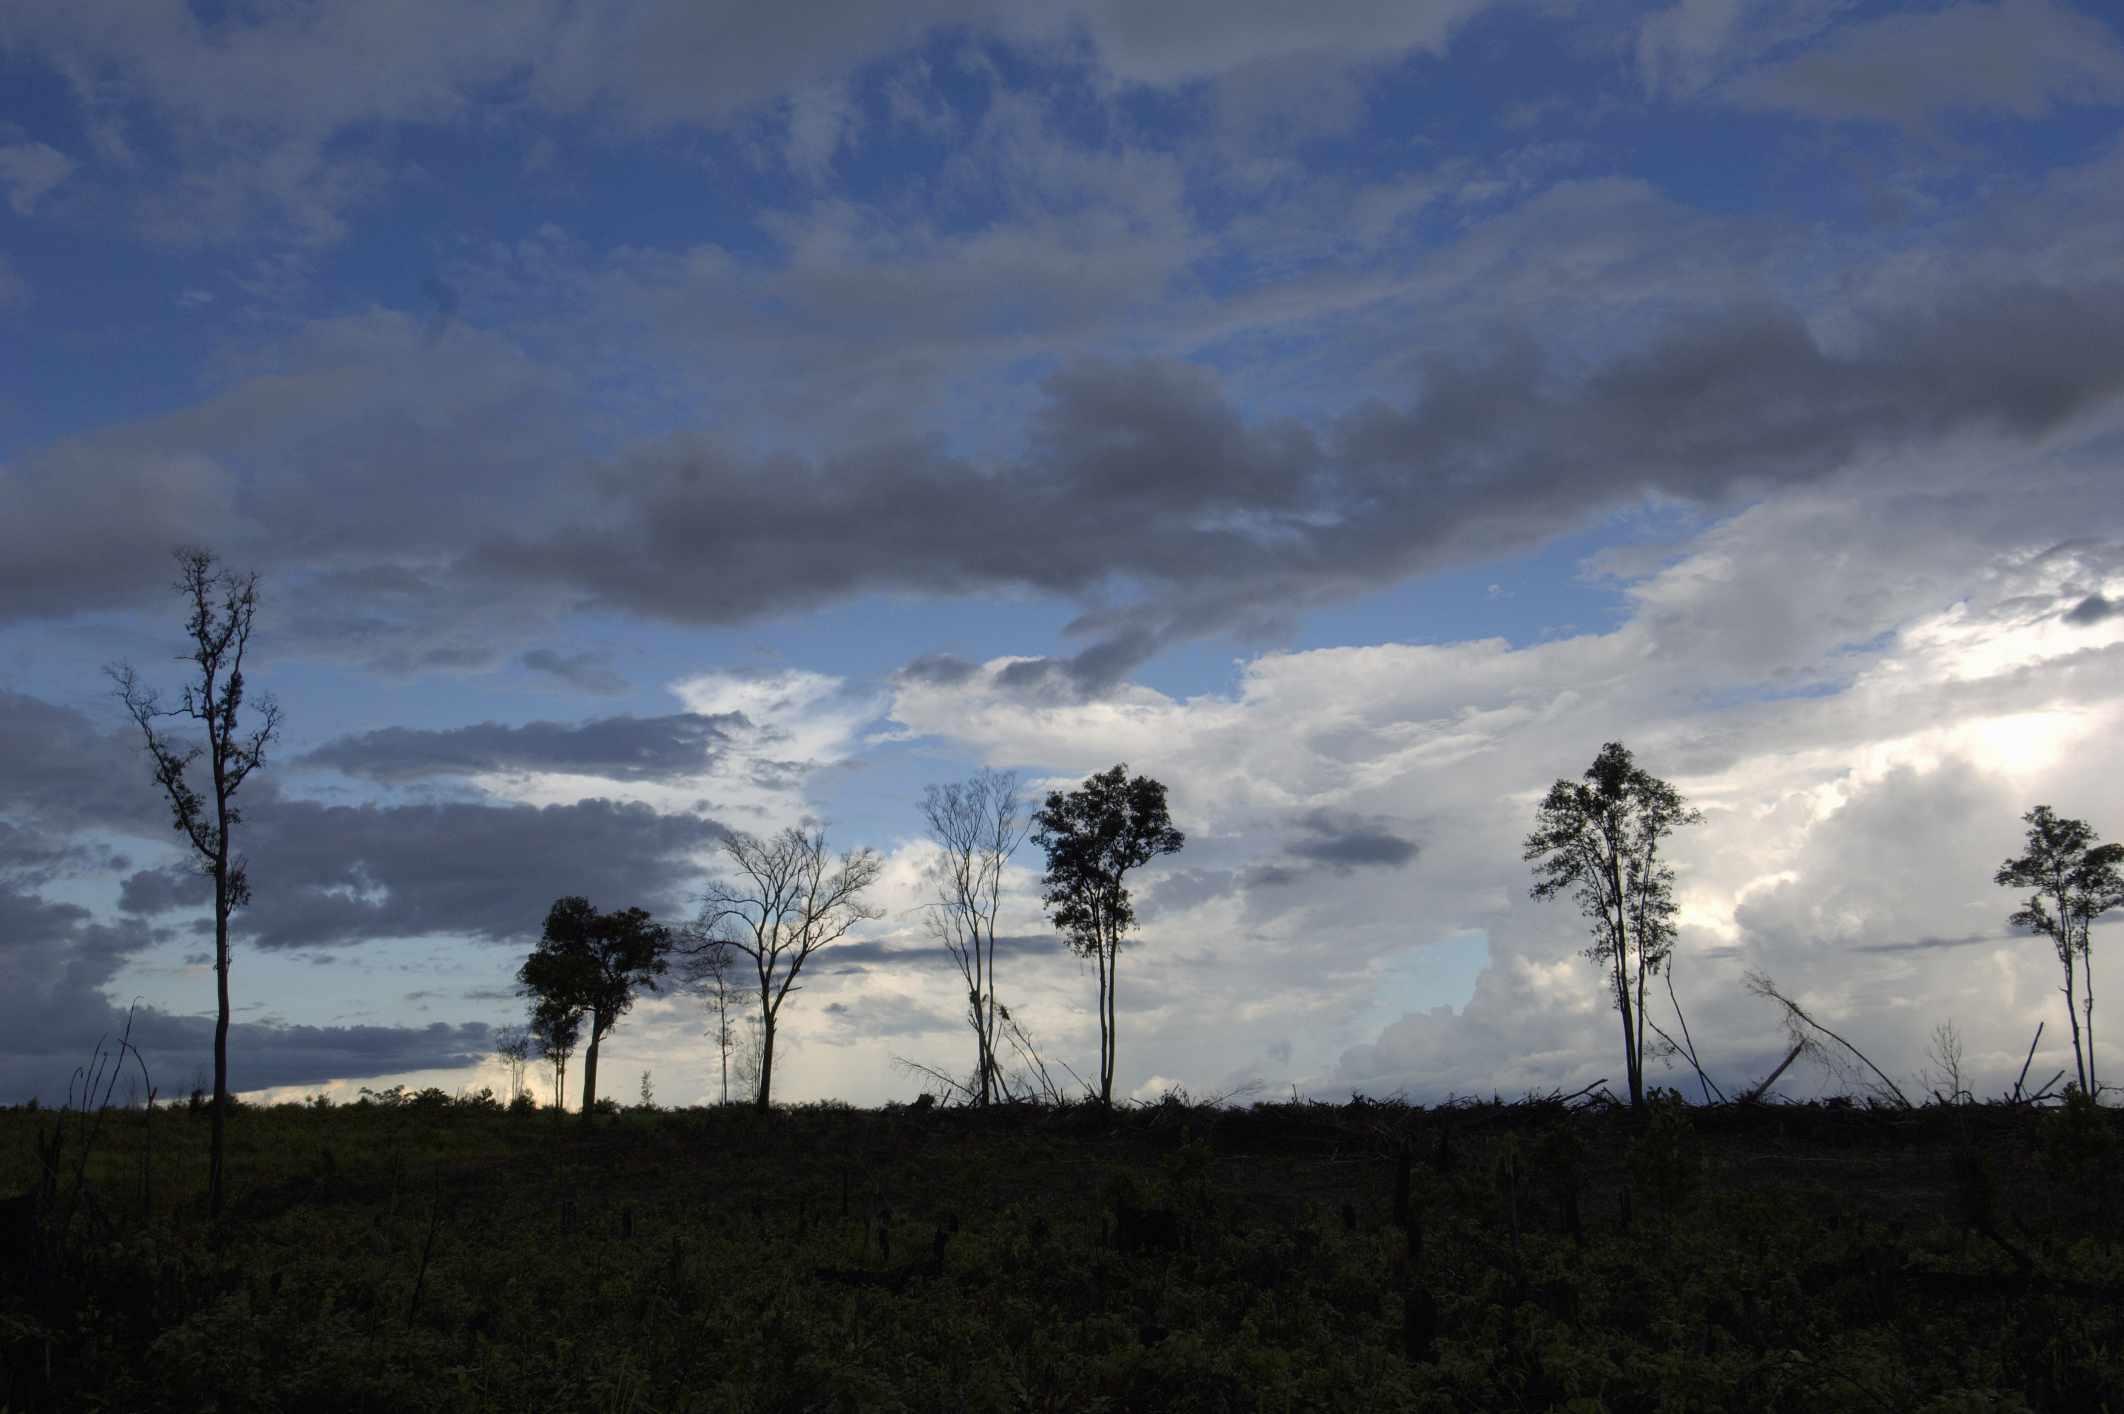 deforestationIndonesia_GavinPearsons_OxfordScientific_Getty.jpg